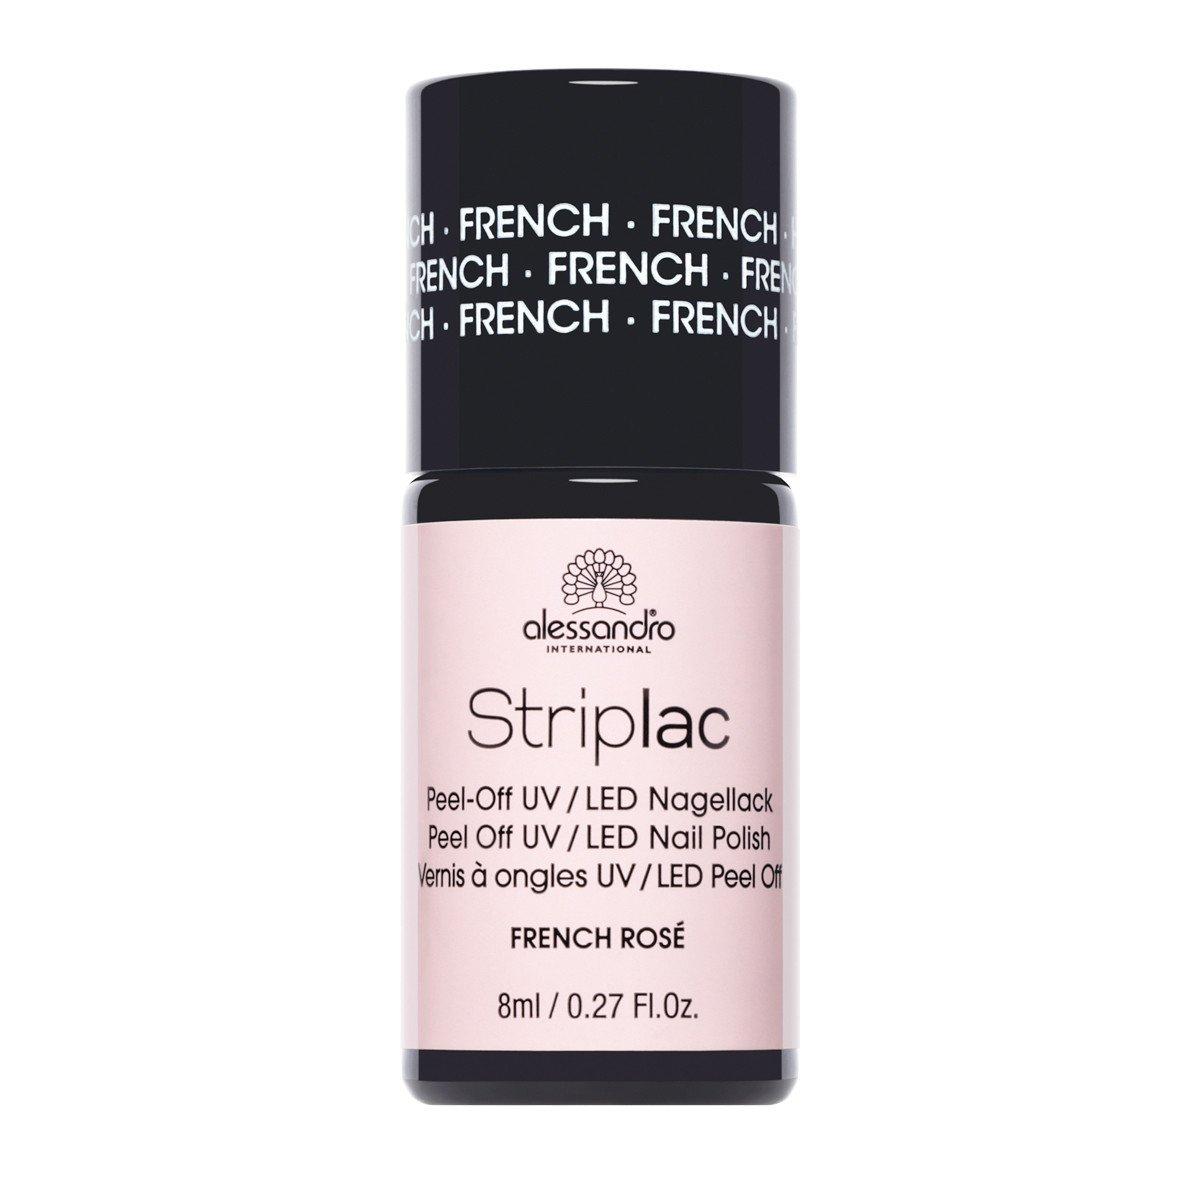 Alessandro International: StripLac - (8 ml): Alessandro International: Farbe: French Pink